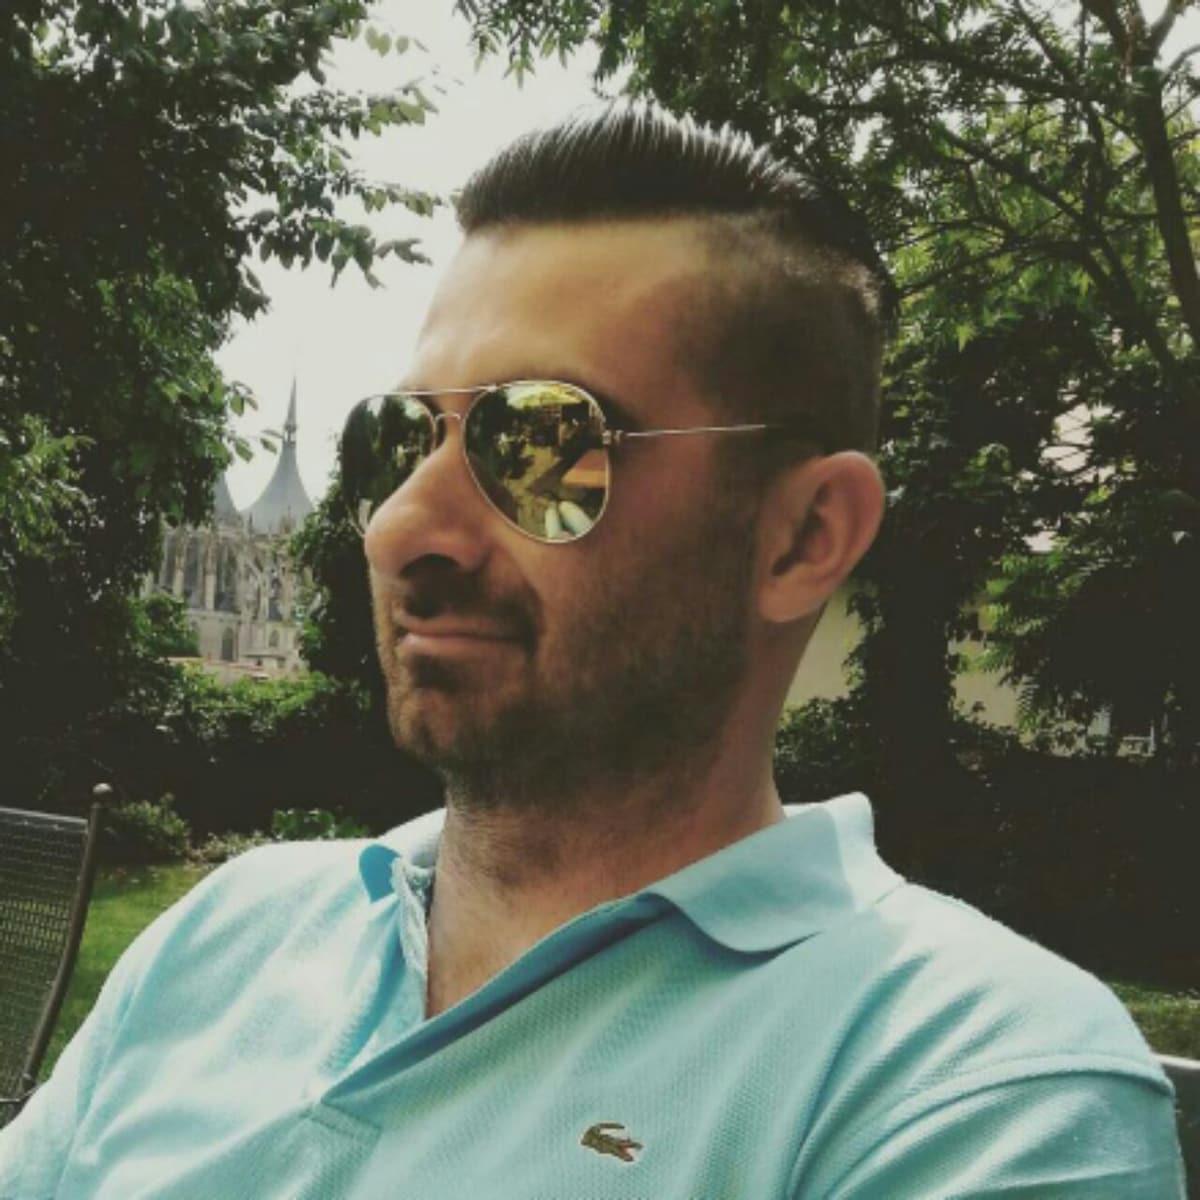 Tomáš From Prague, Czech Republic